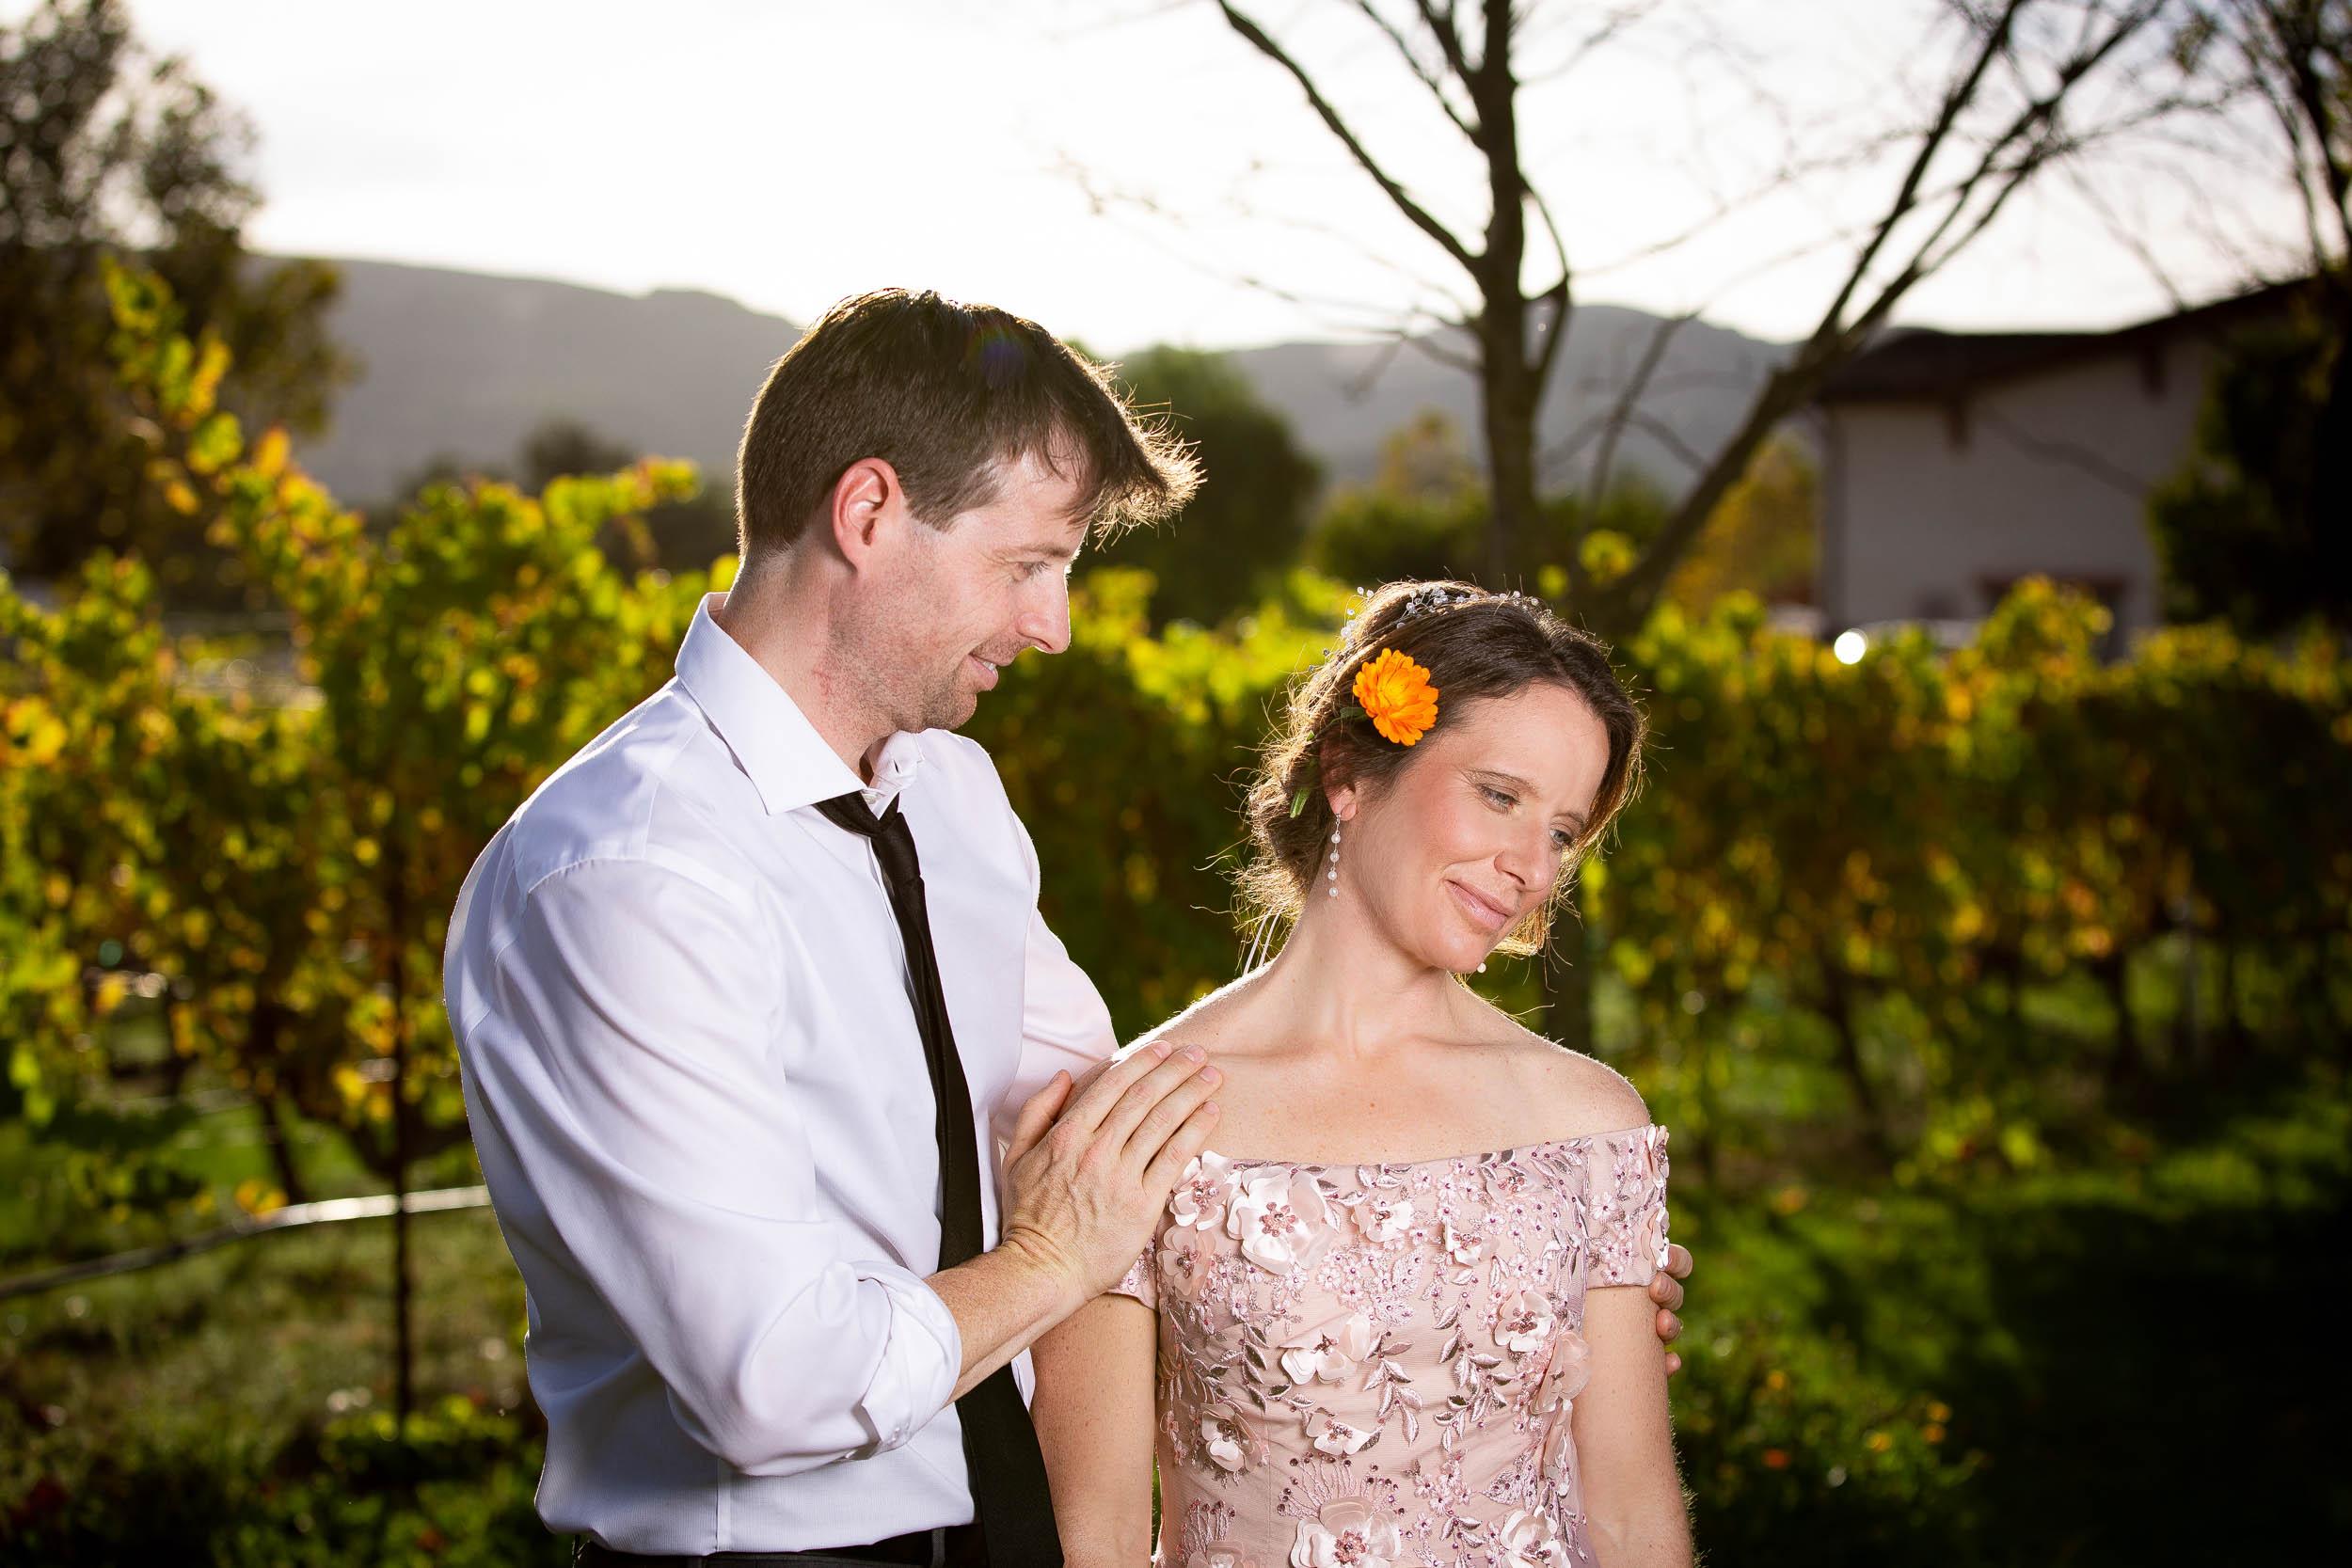 Jacuzzi Family Vineyards Wedding Photos-27.jpg